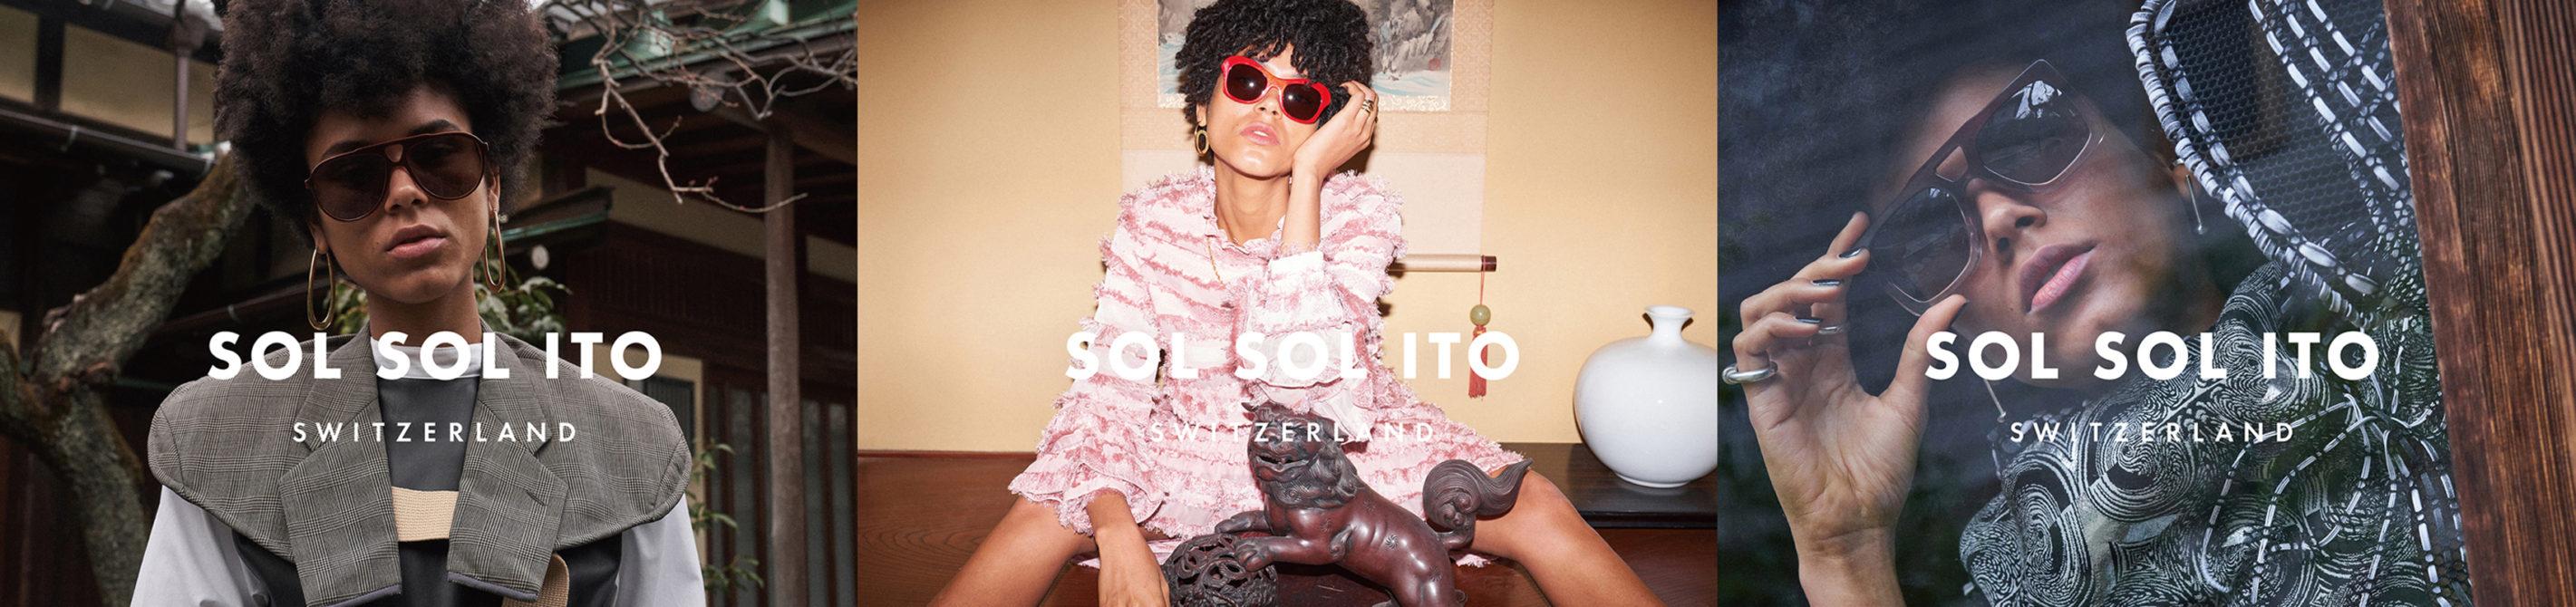 SOL SOL ITO eyewear 2020